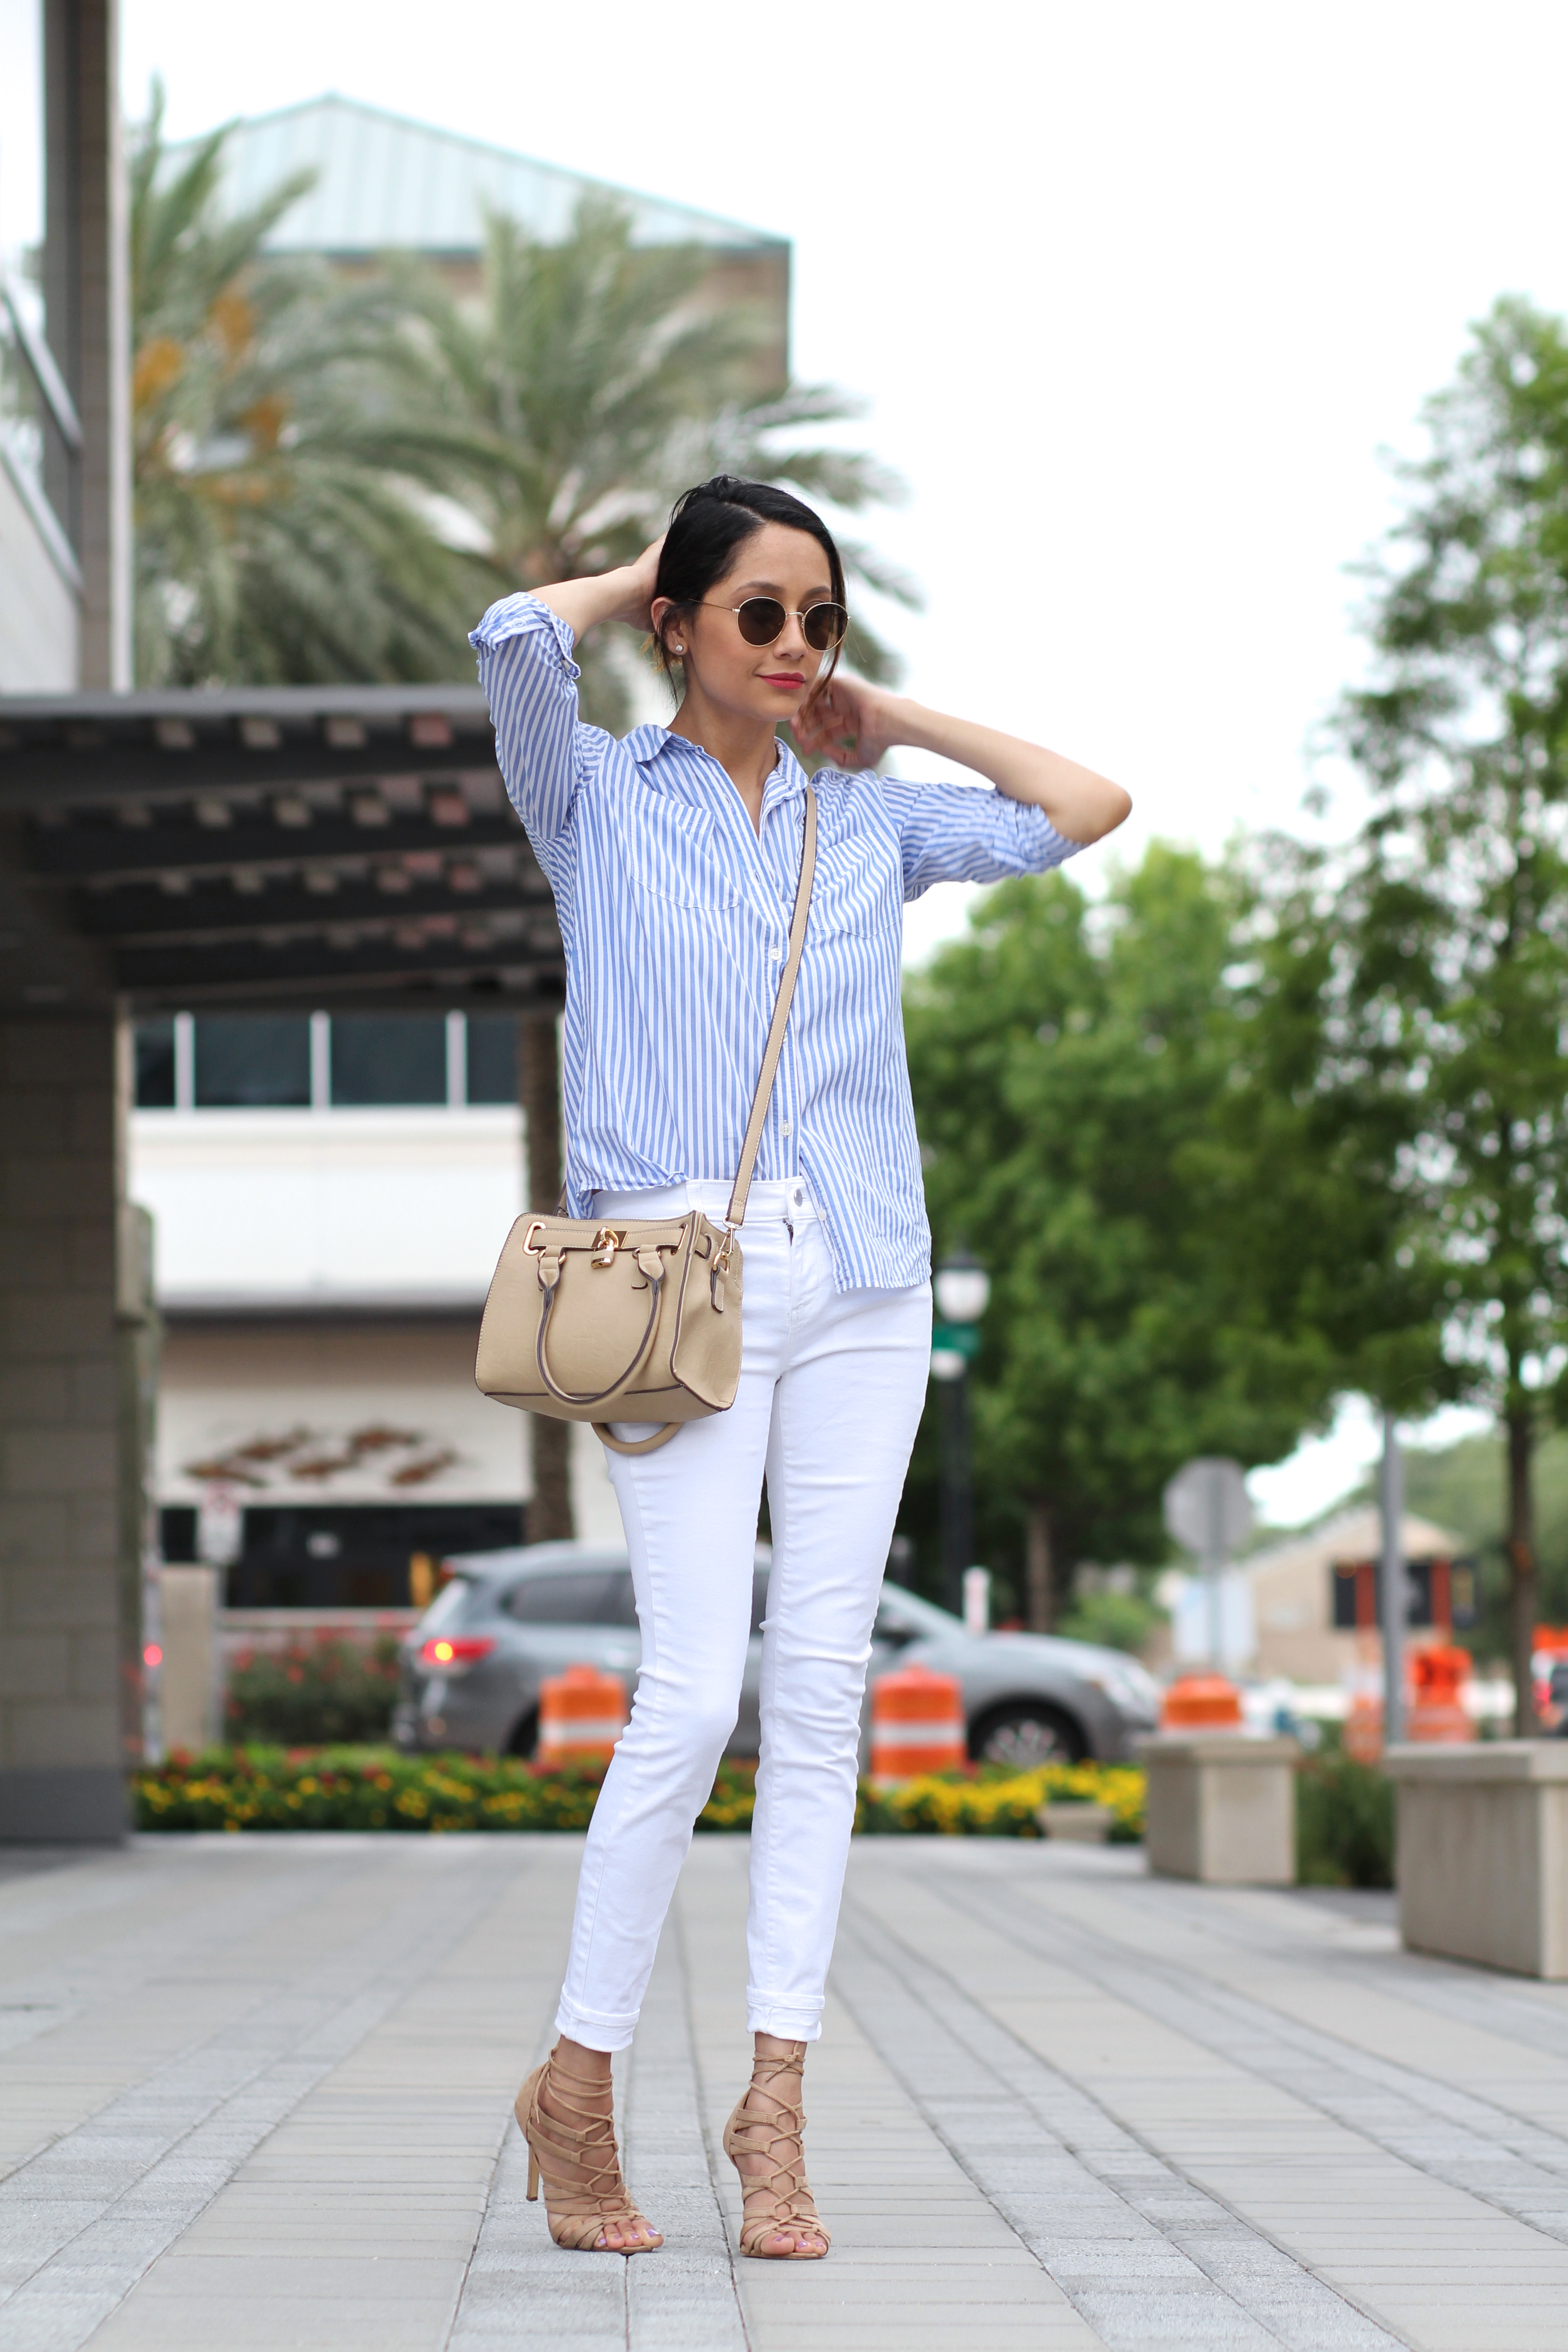 How To Wear Vertical Stripes In Summer | White Denim | Summer Look